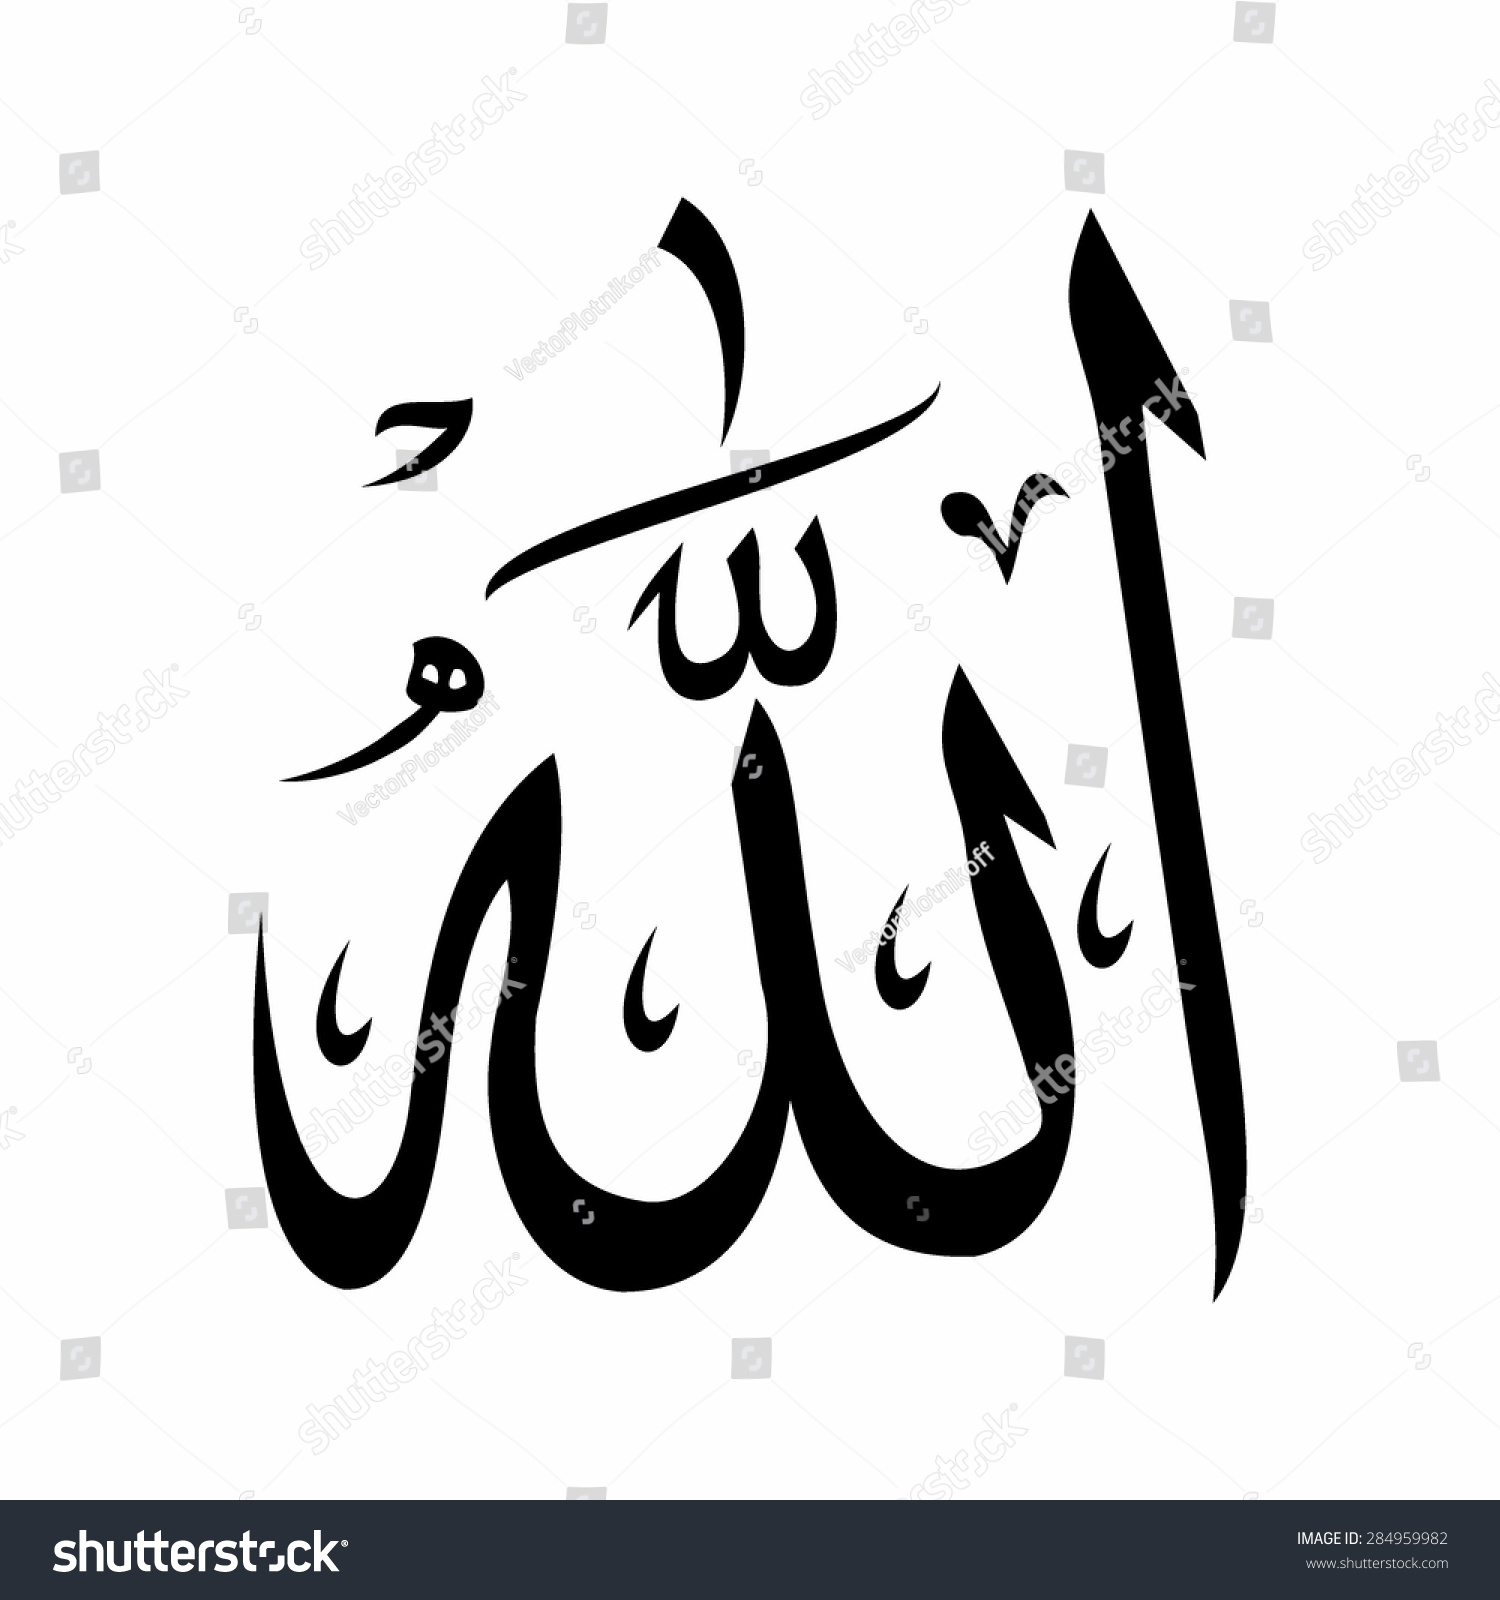 Allah Arabic Writing God Name Arabic Stock Vector